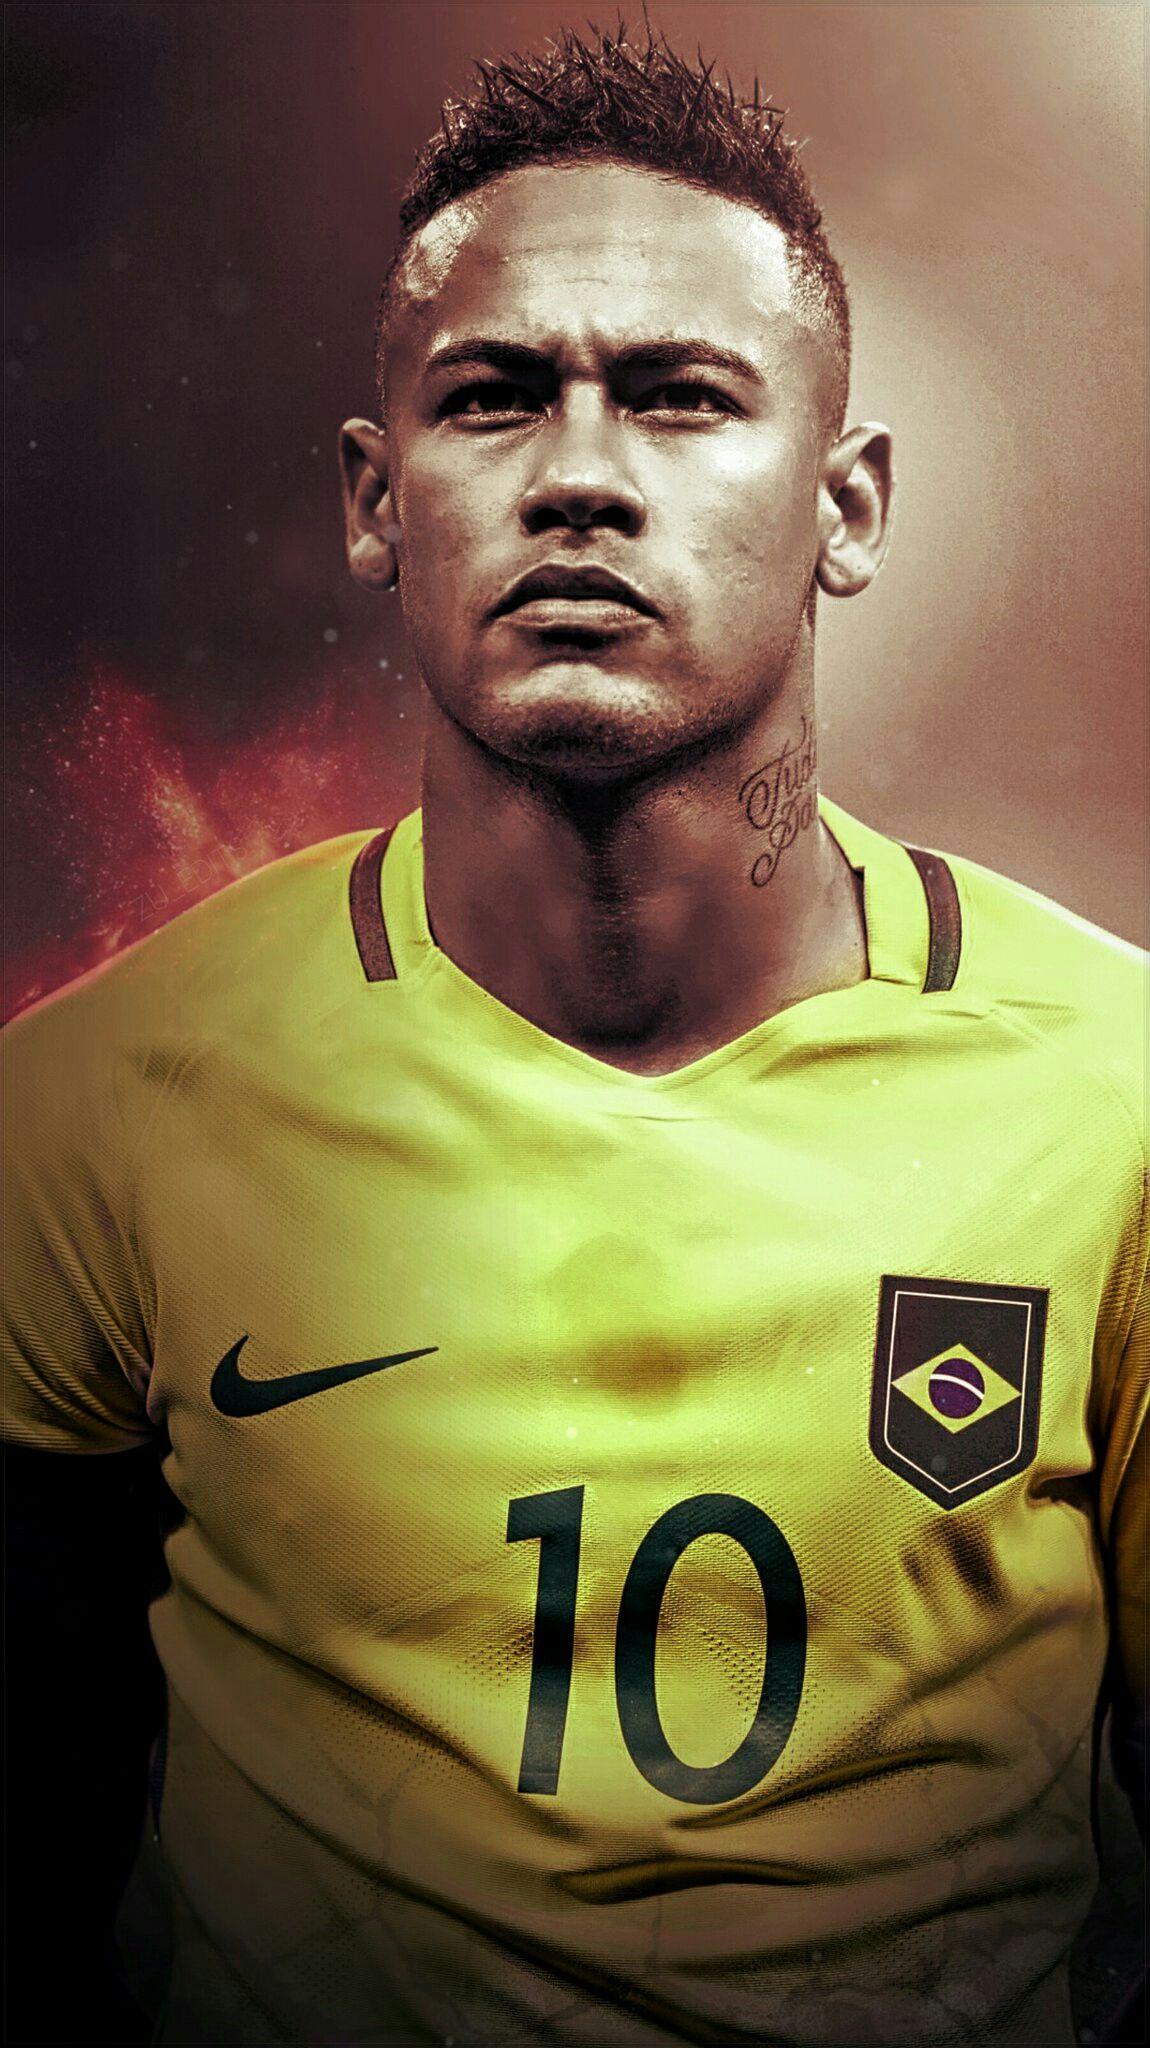 Neymar Jogadores De Futebol Futebol Neymar Futebol Feminino Brasil